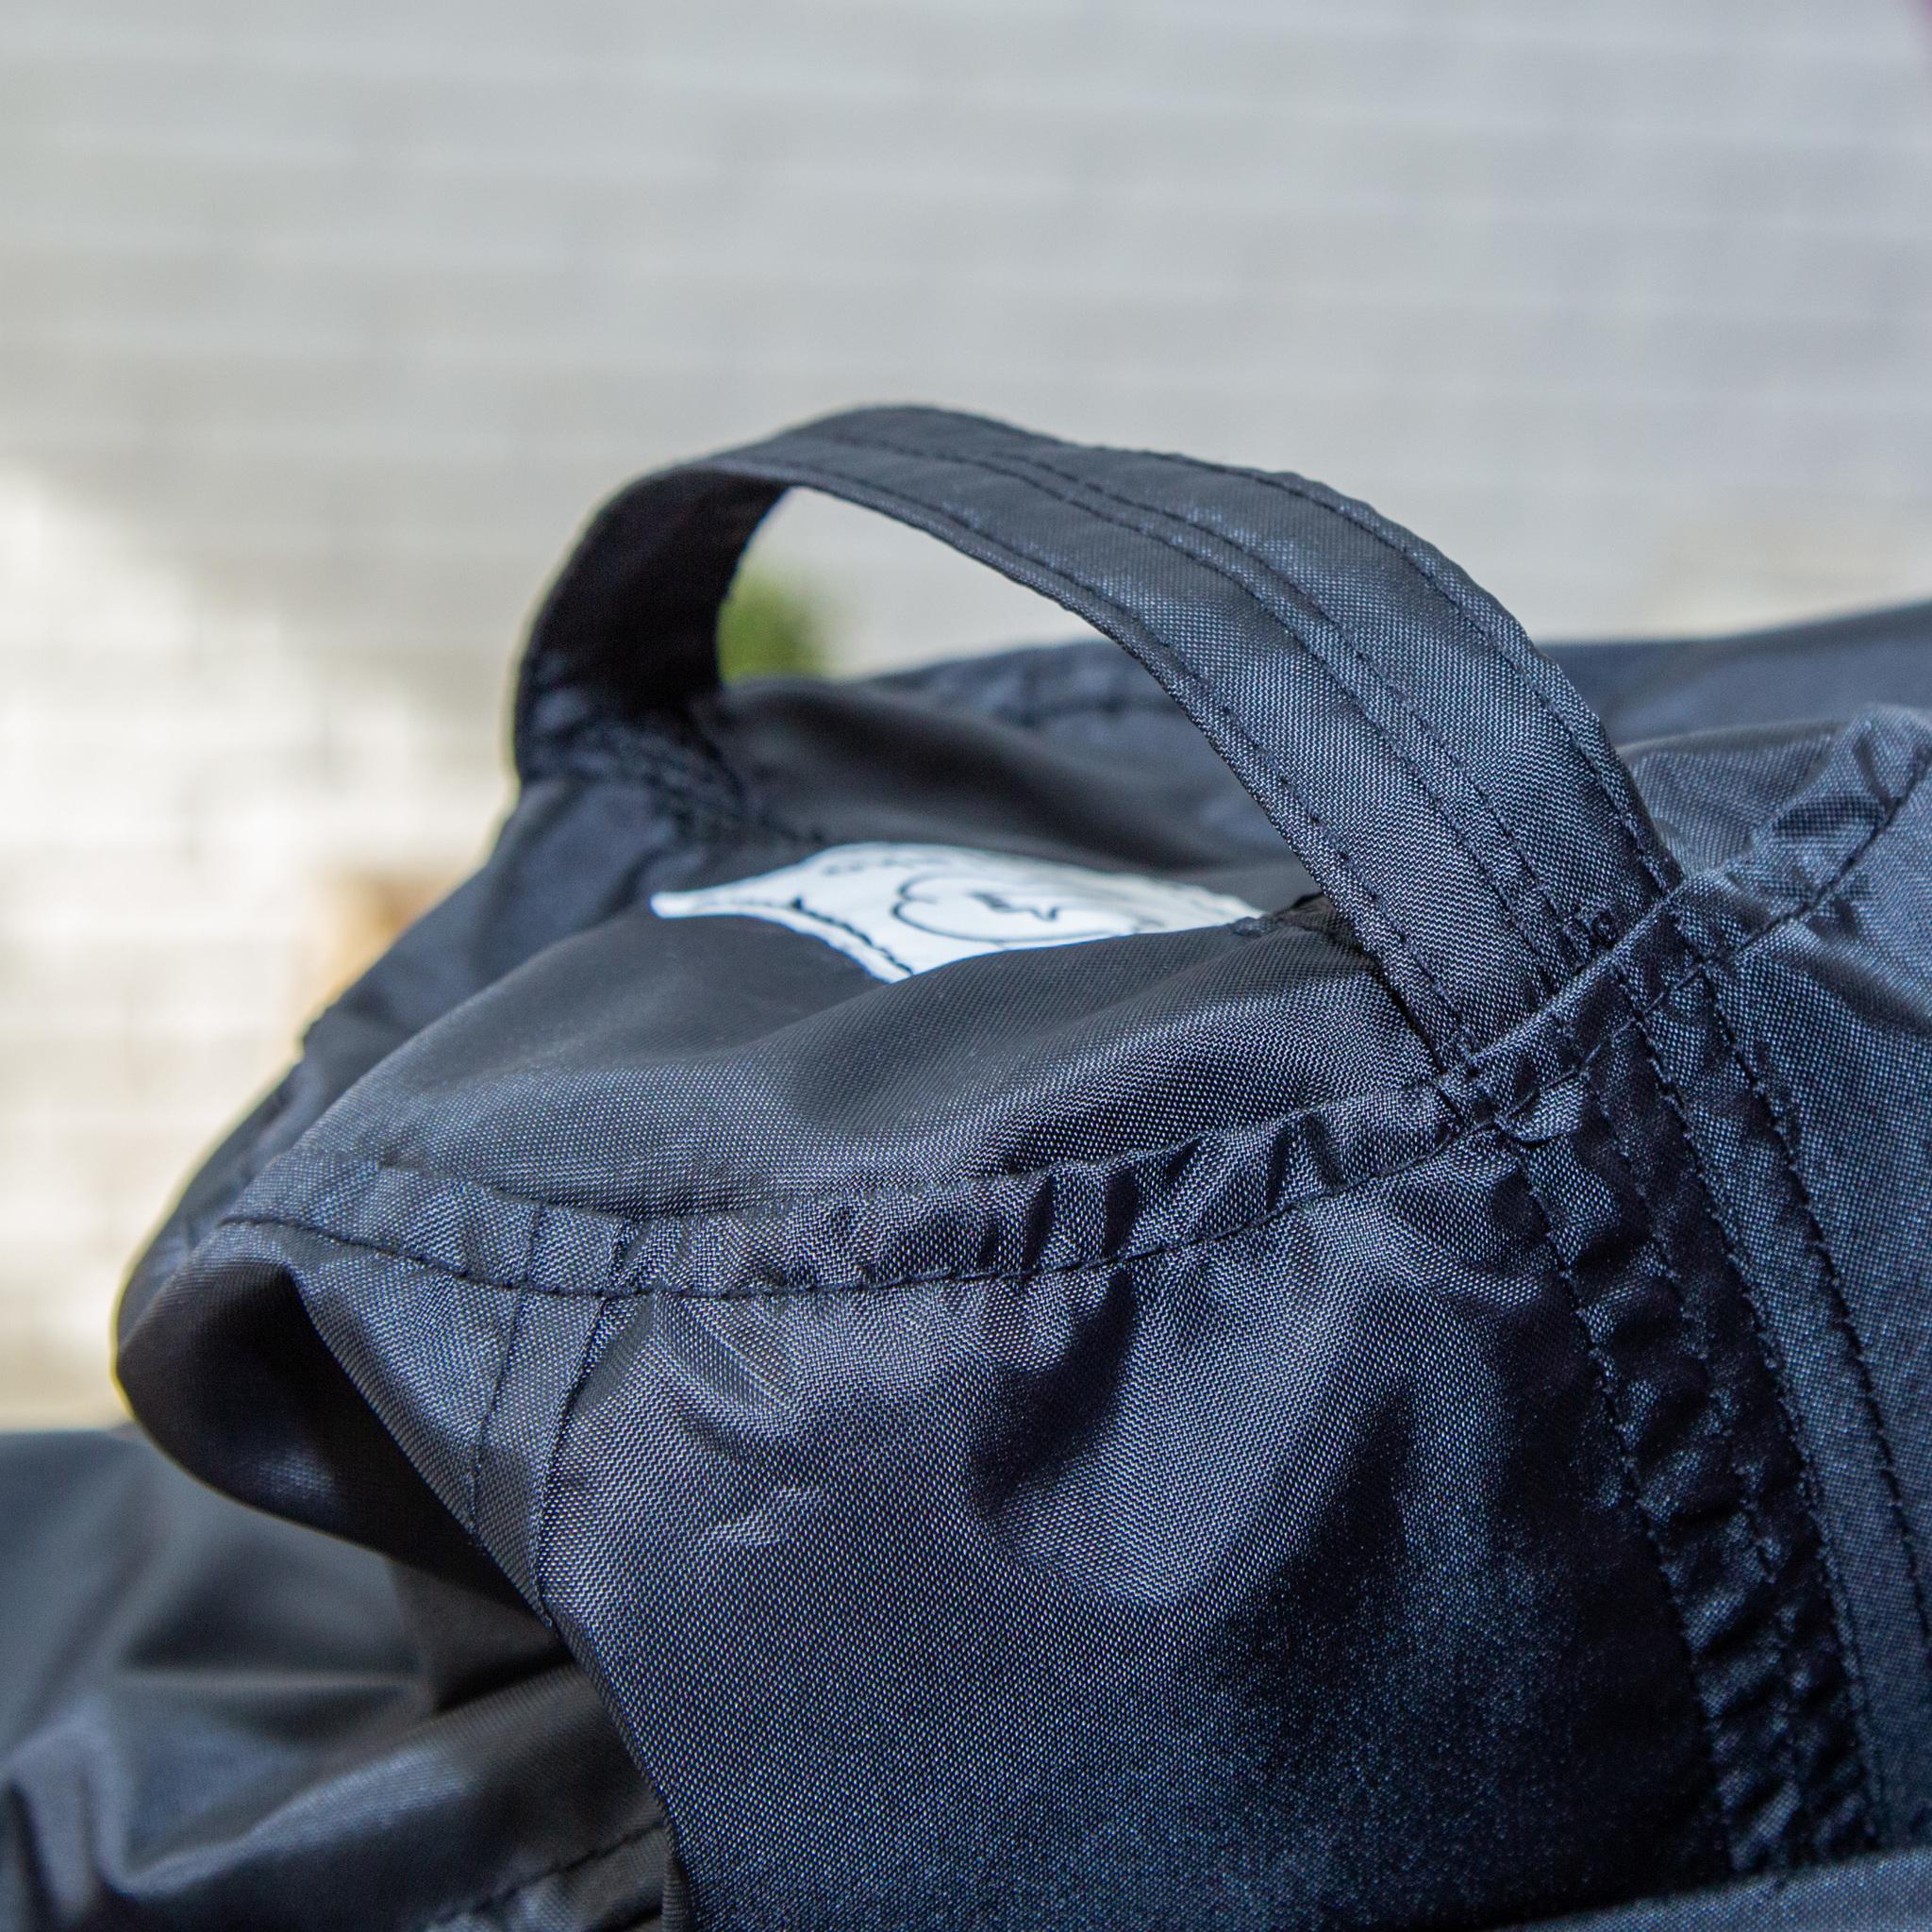 Груша M плащёвка, съёмный чехол (чёрная)